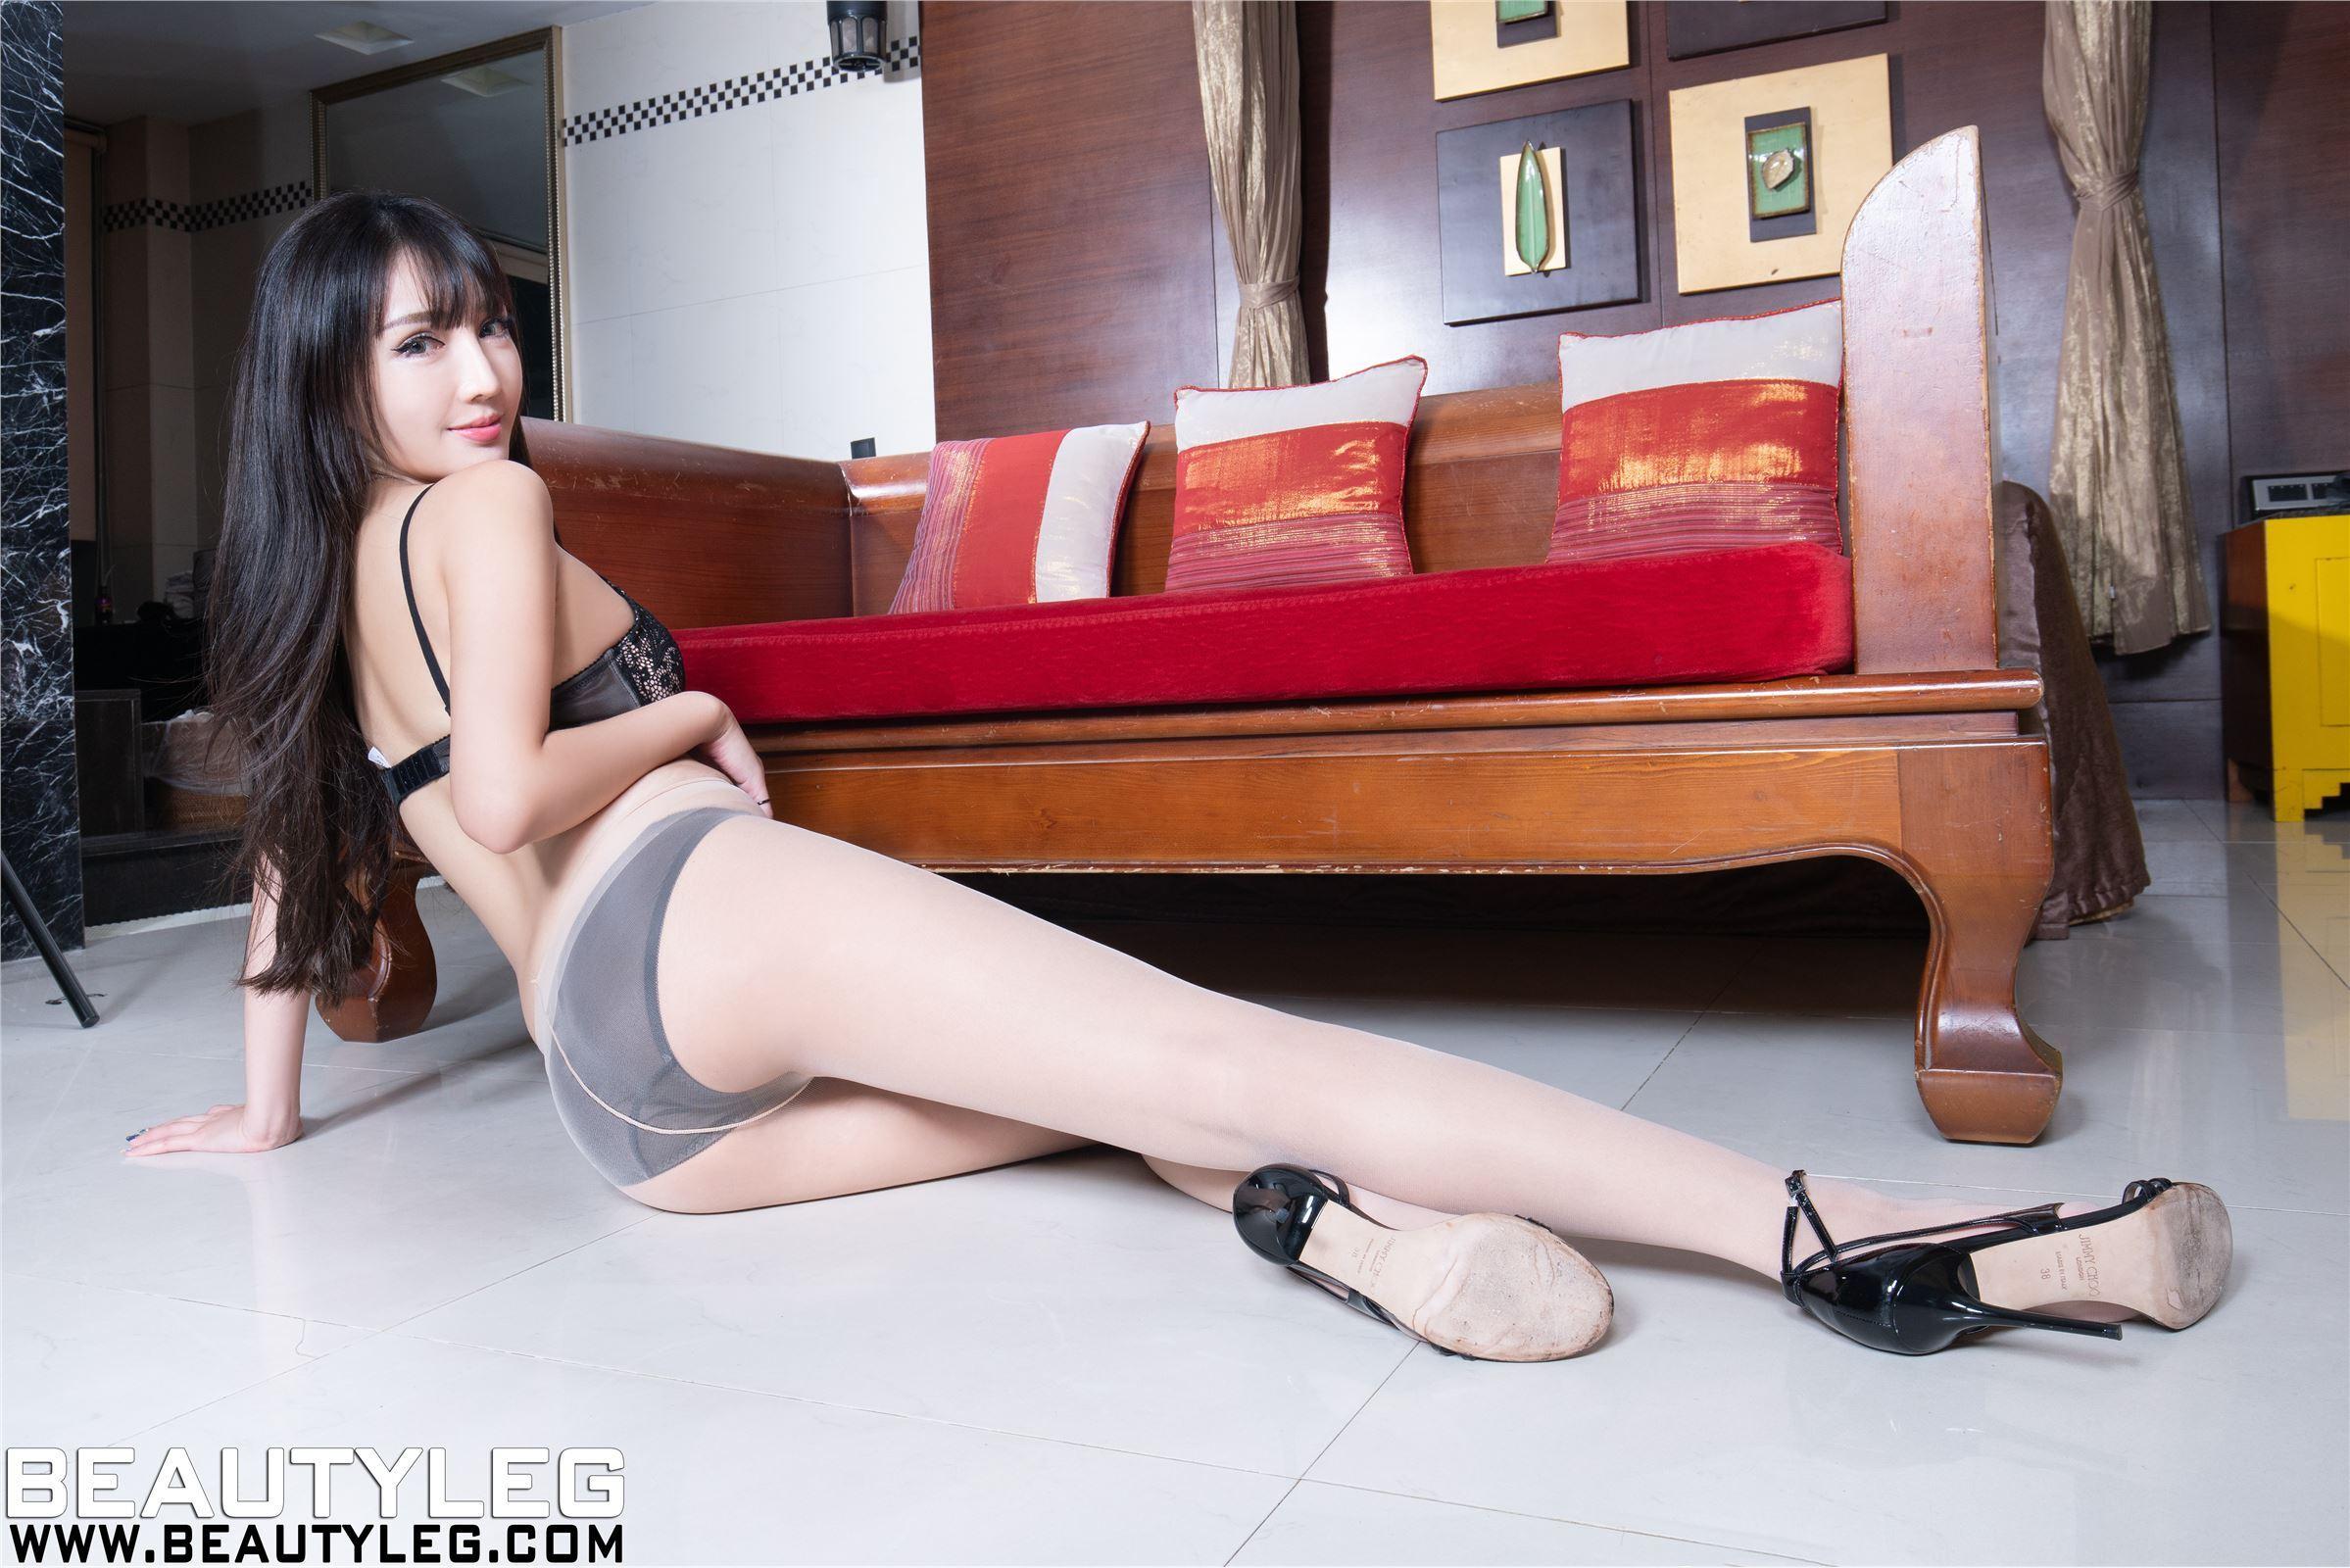 Beautyleg 2018.10.15 No.1672 Syuan